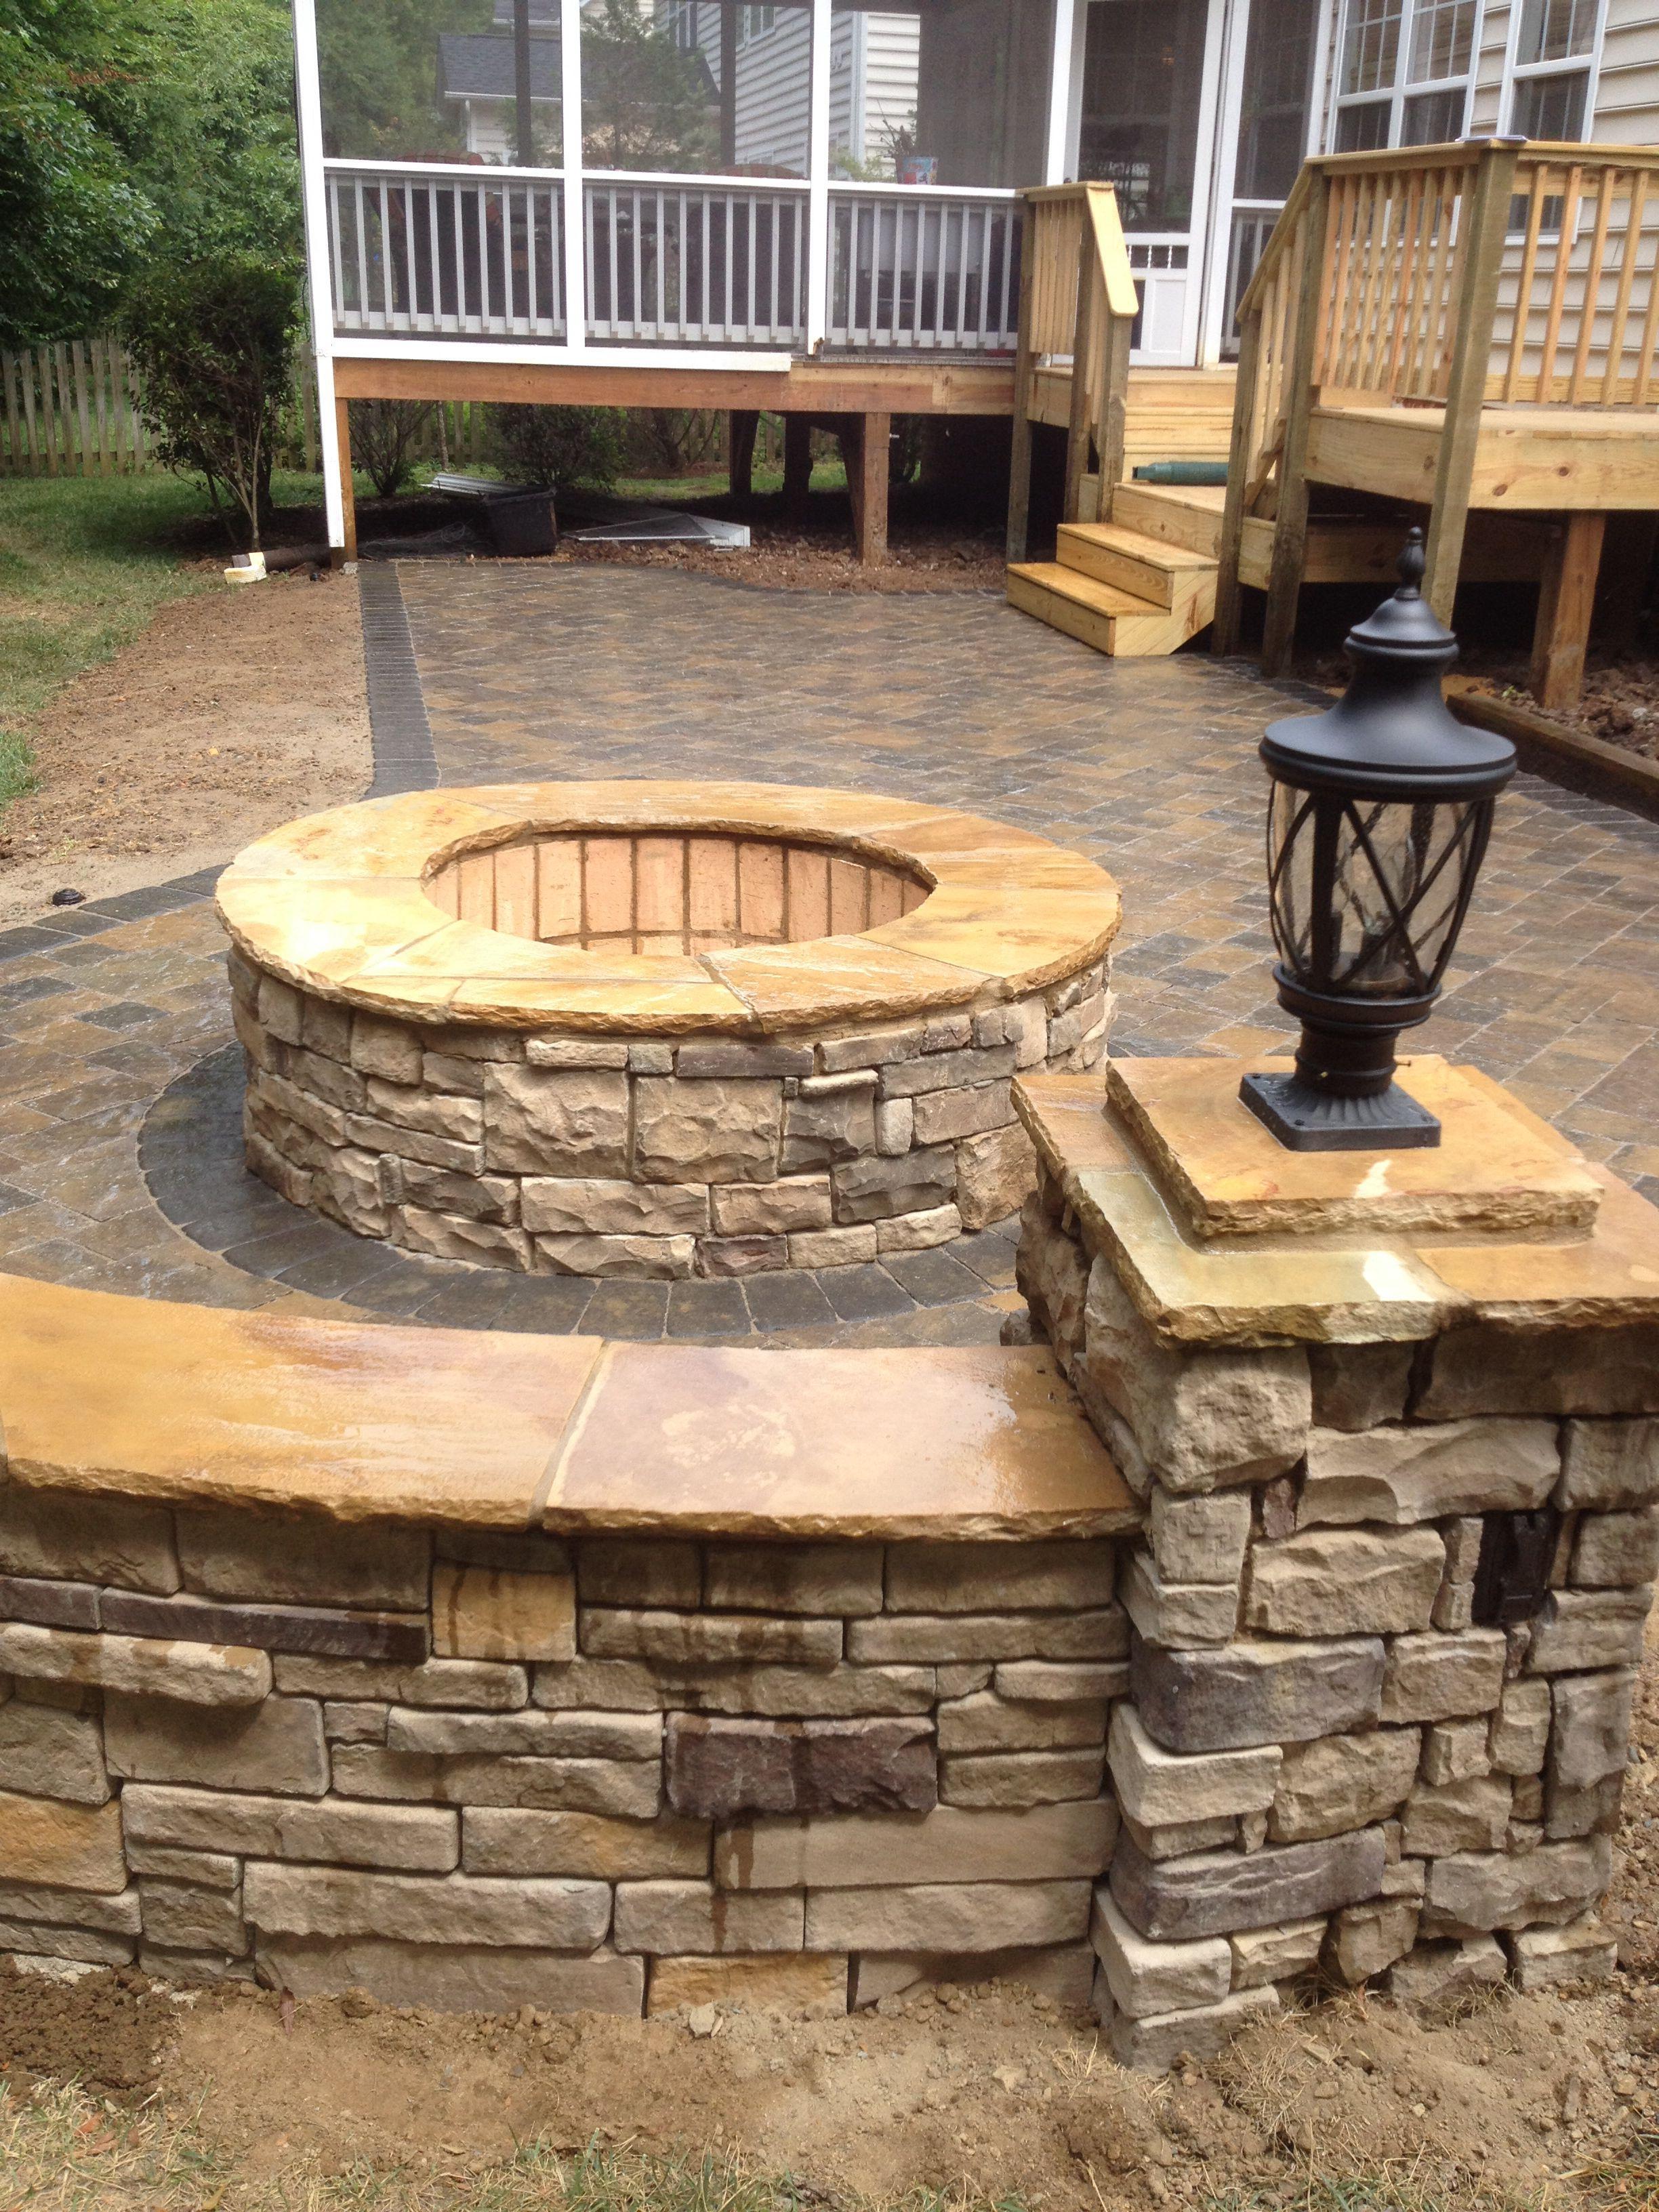 charlotte nc area paver patio with masonry firepit stone columns